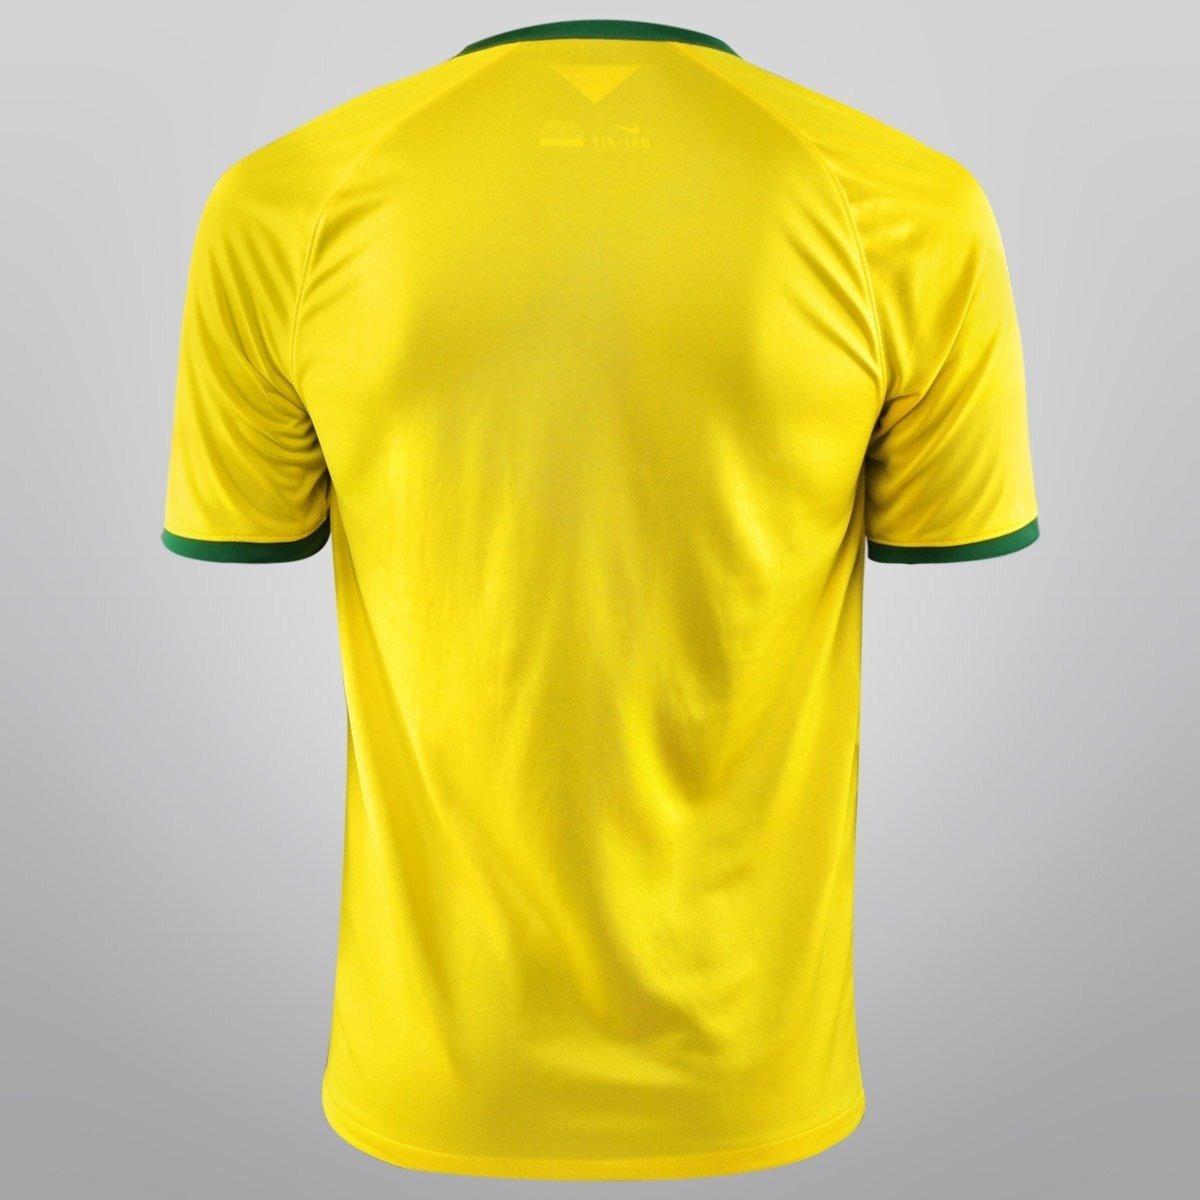 camisa oficial do brasil copa 2014 amarela oficial fifa nike. Carregando  zoom. 60a226210be32